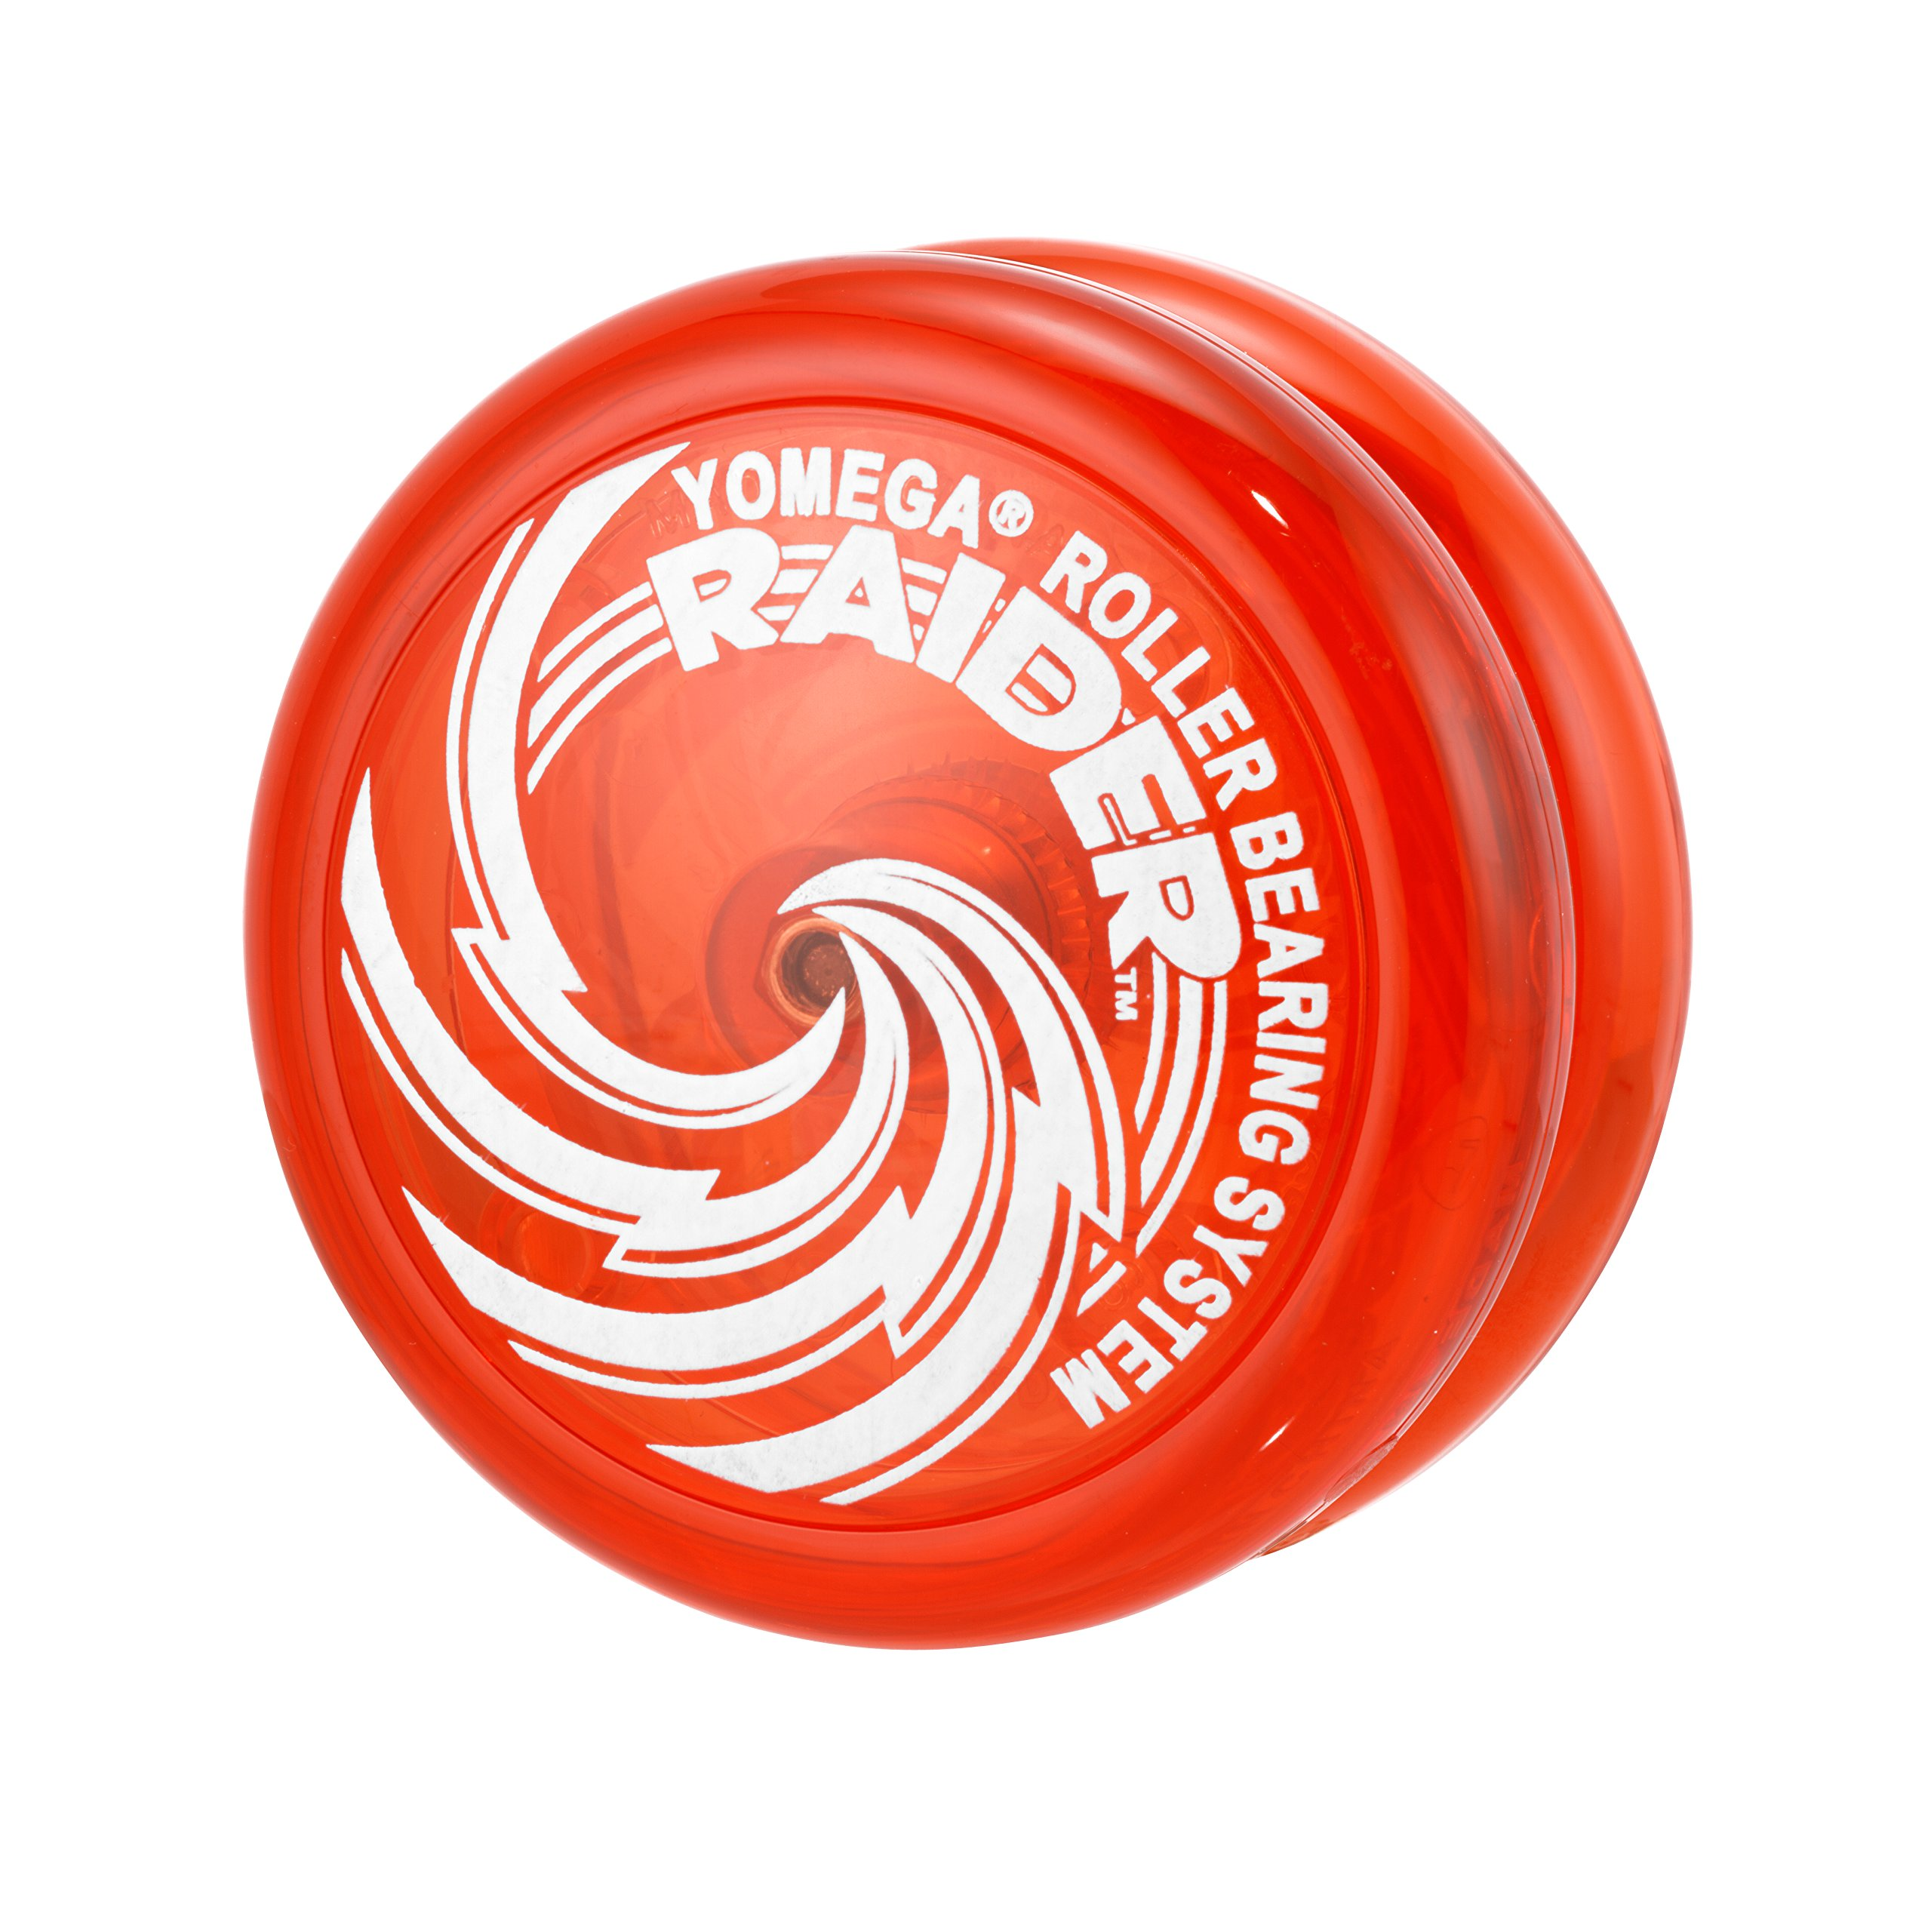 Yomega Raider – Responsive Pro Level Ball Bearing Yoyo, Designed for Advanced String Trick and Looping Play (Color May Vary)